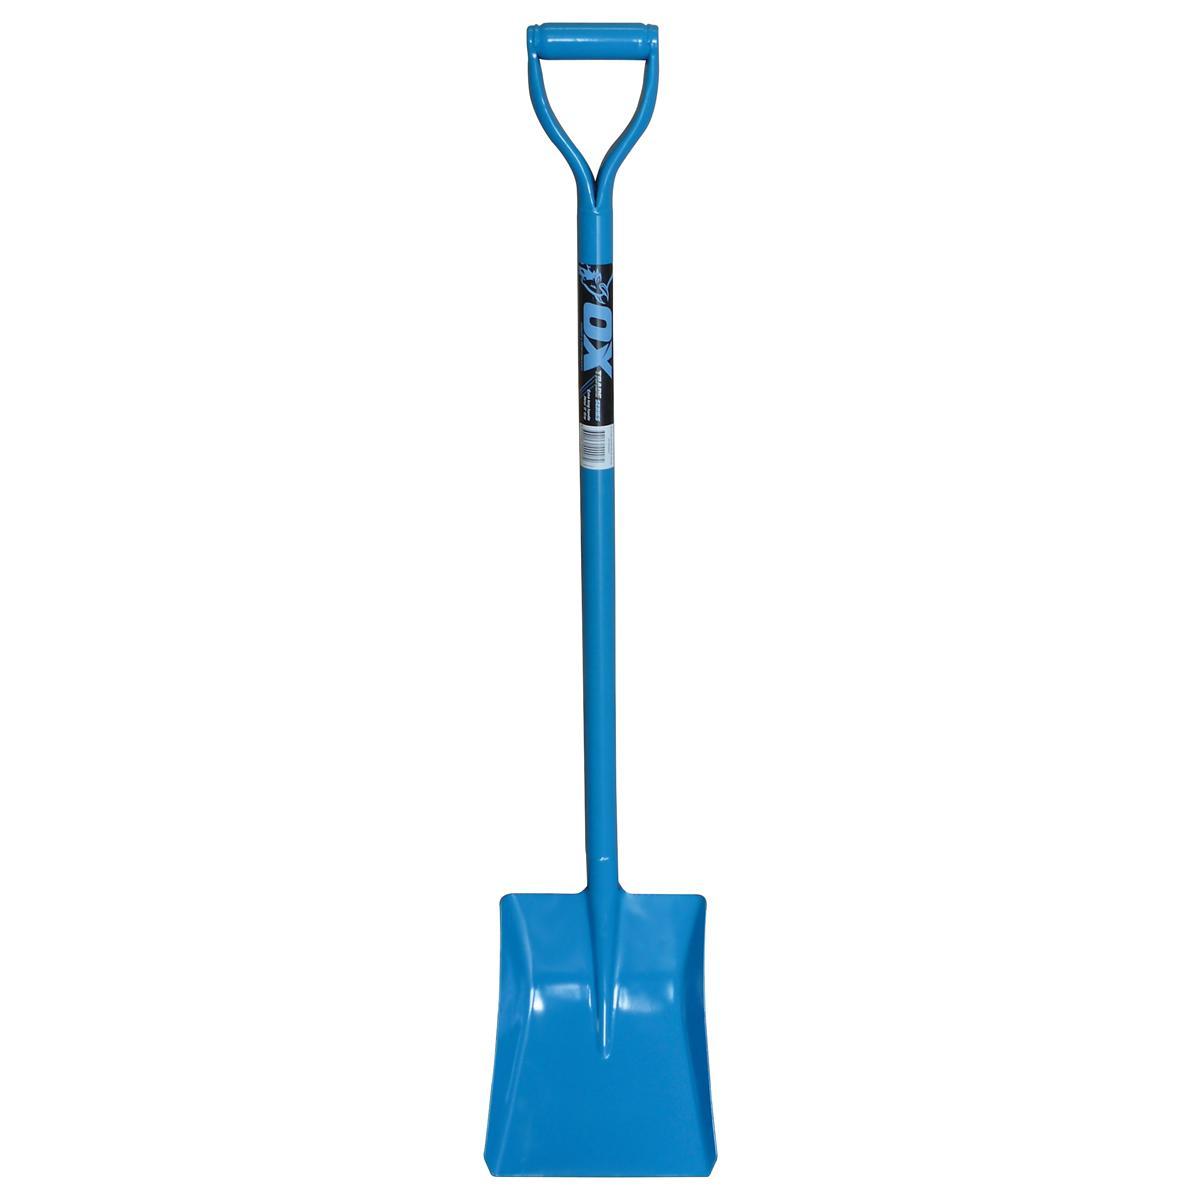 OX Trade Sqr mouth Shovel D Grip Hdl-120